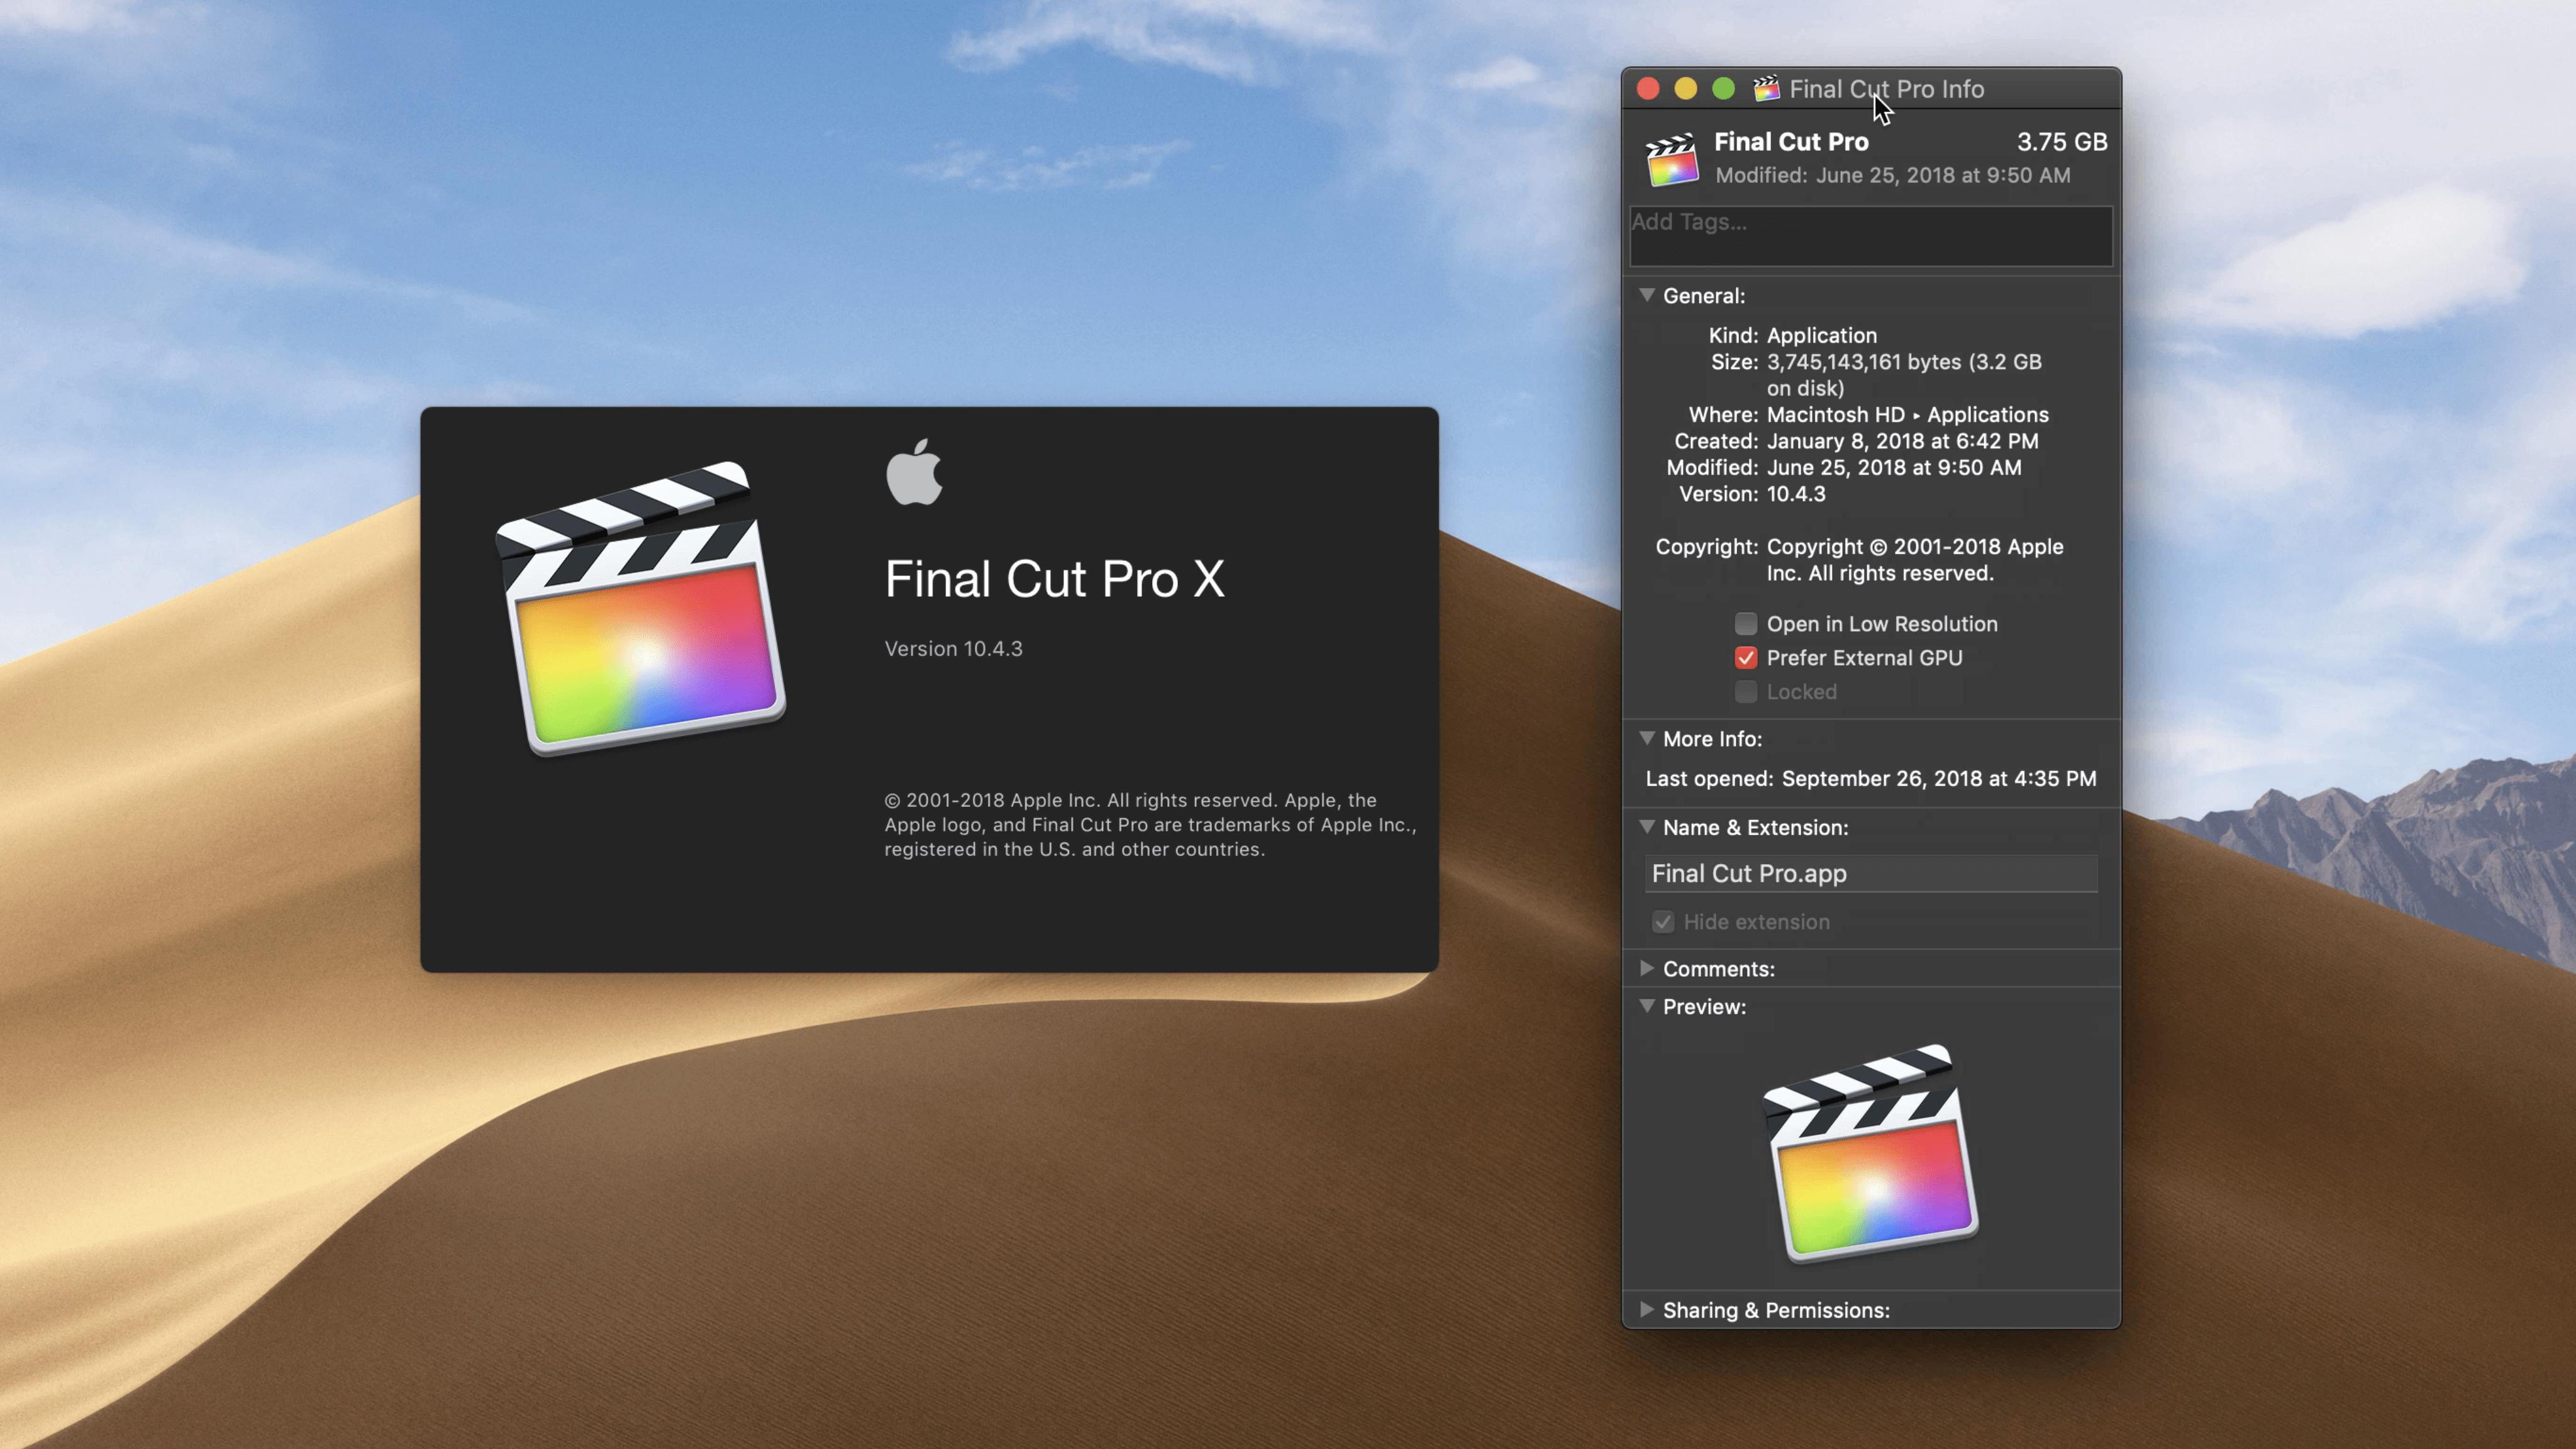 eGPU no Final Cut Pro - macOS Mojave